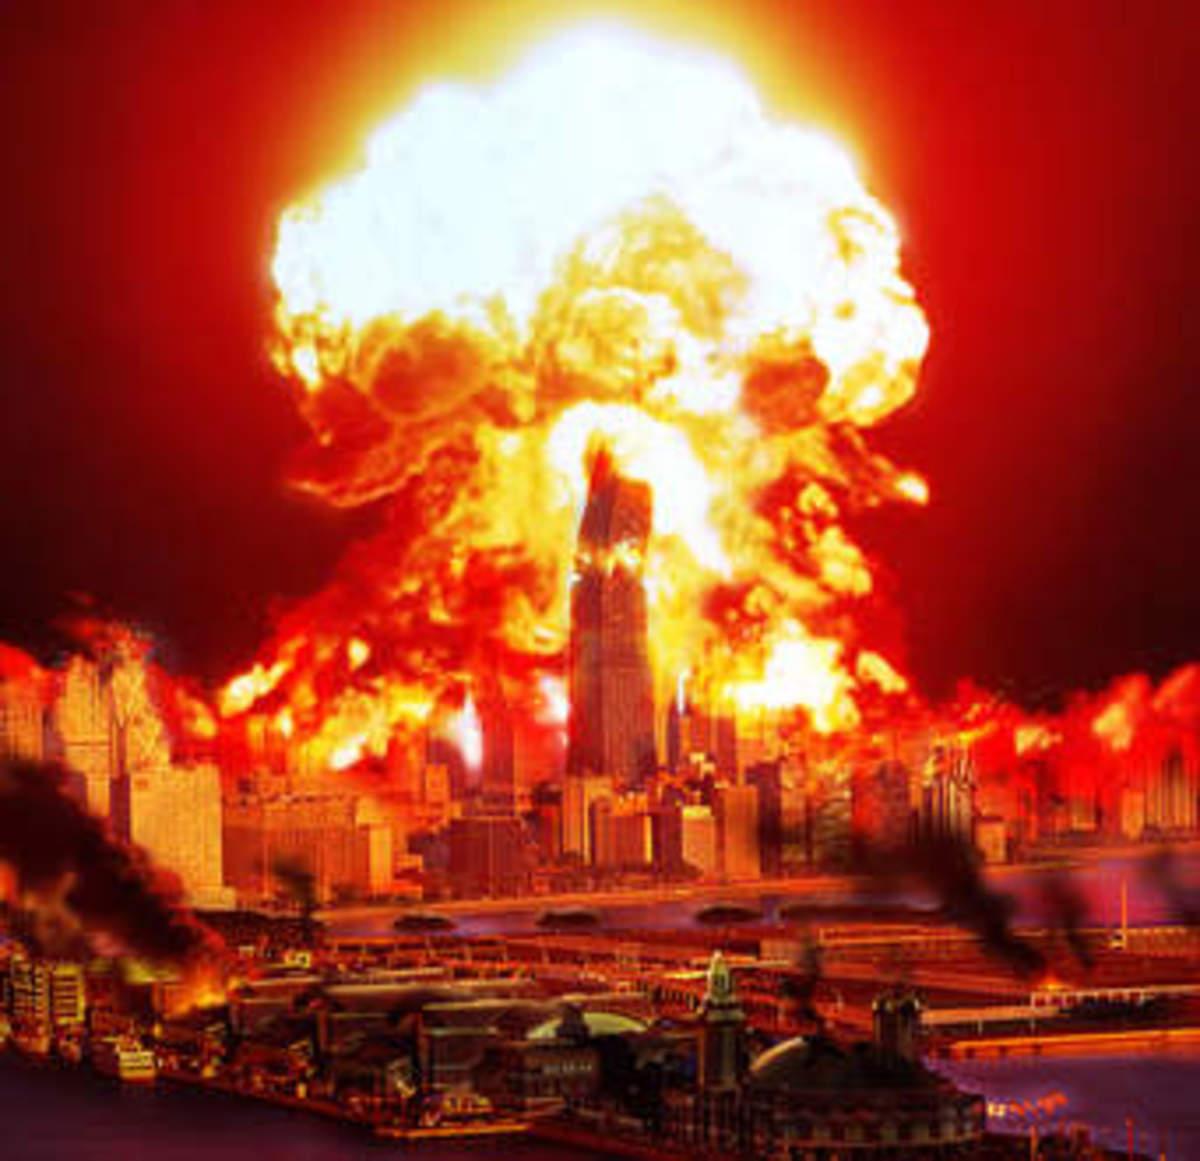 Earth's Destruction by fire